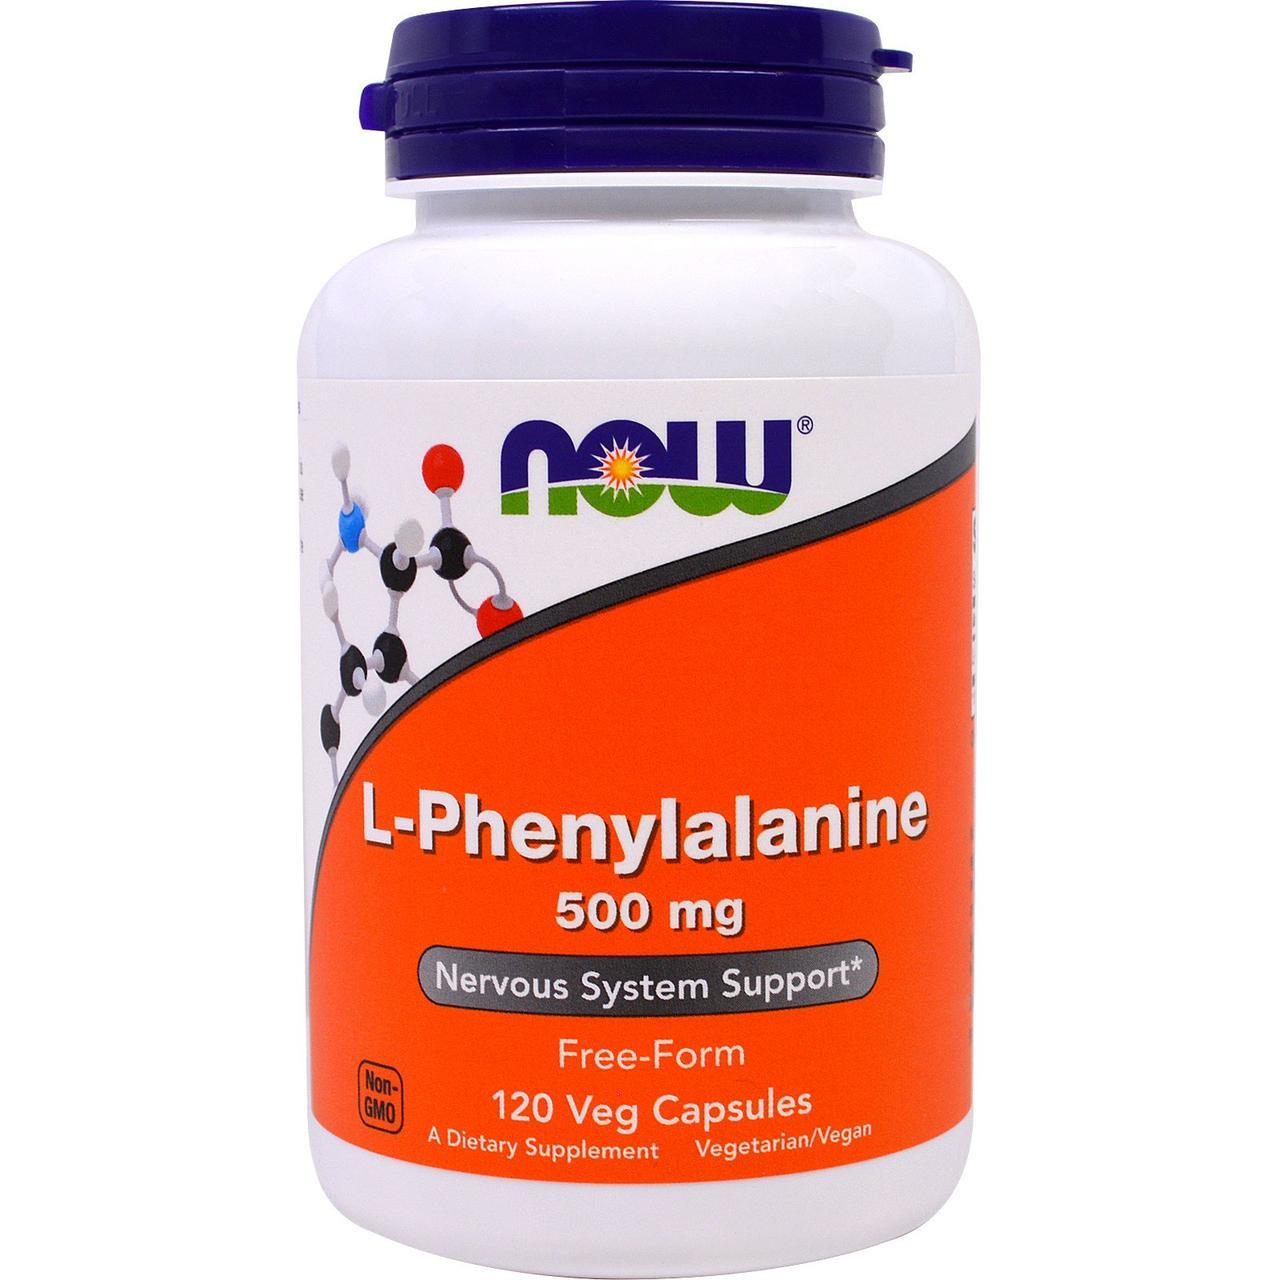 Фенілаланін, амінокислота, L-Phenylalanine, Now Foods, 500 мг, 120 капсул